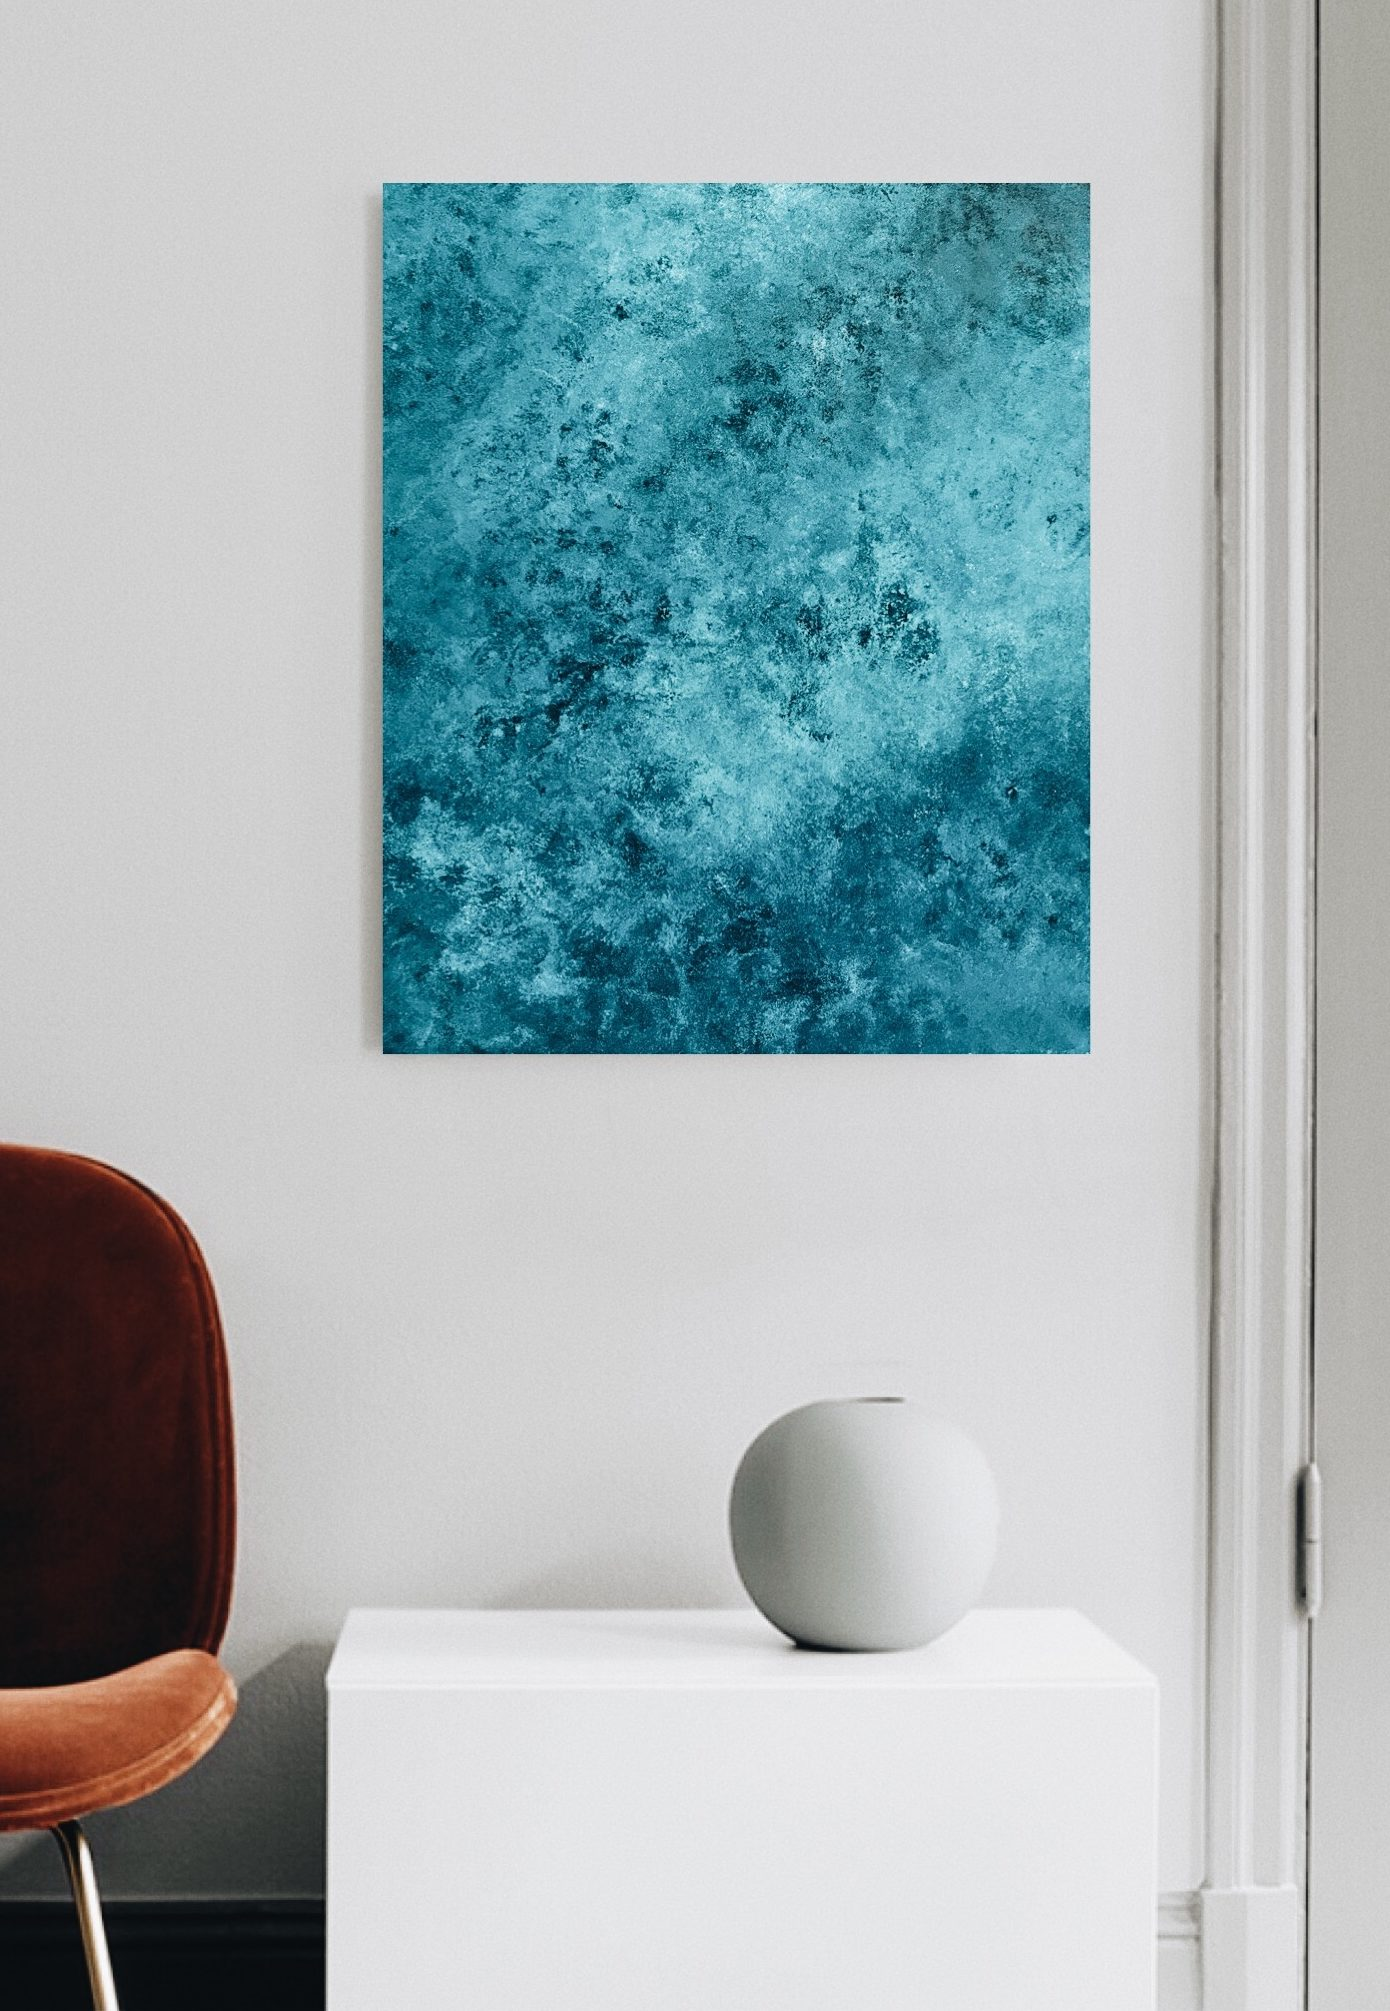 Marine Bonzom - Artiste Peintre Biarritz - Home - Oh My Blue I I